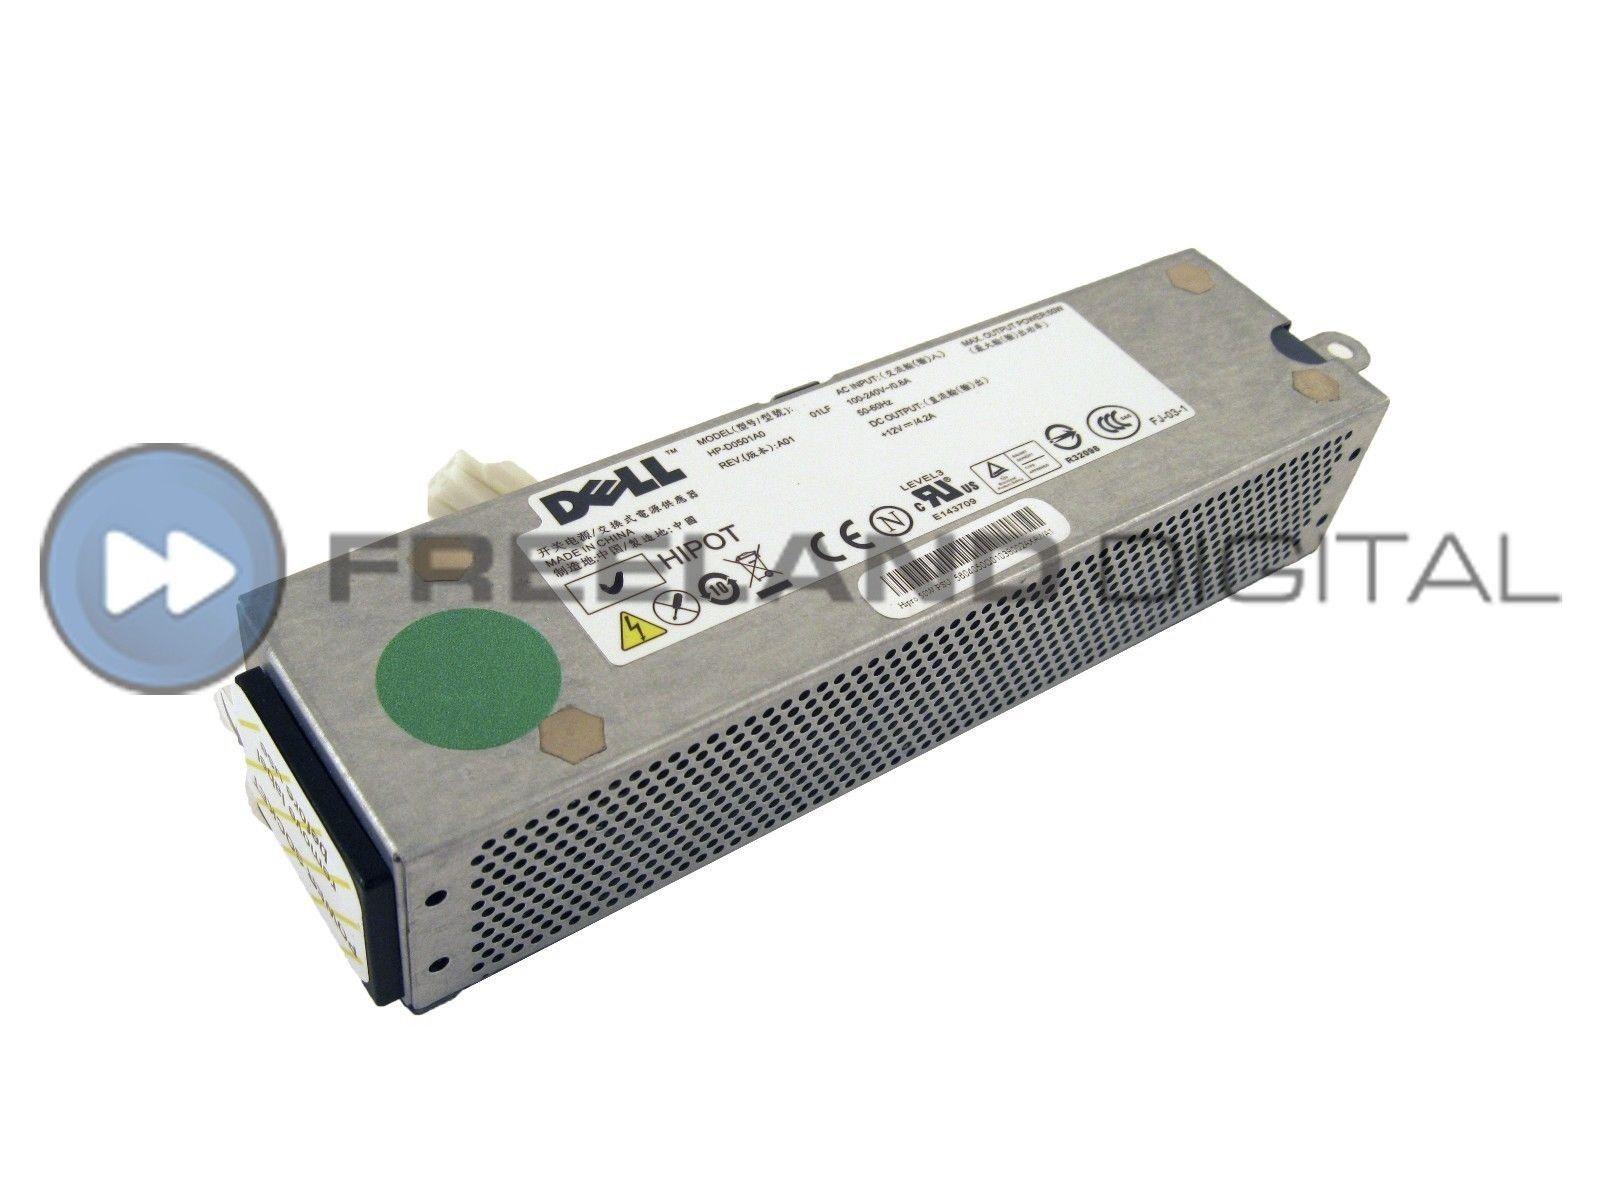 NEW Dell G151G Optiplex FX160 Mini Desktop 50w PSU Power Supply HP-D0501A0